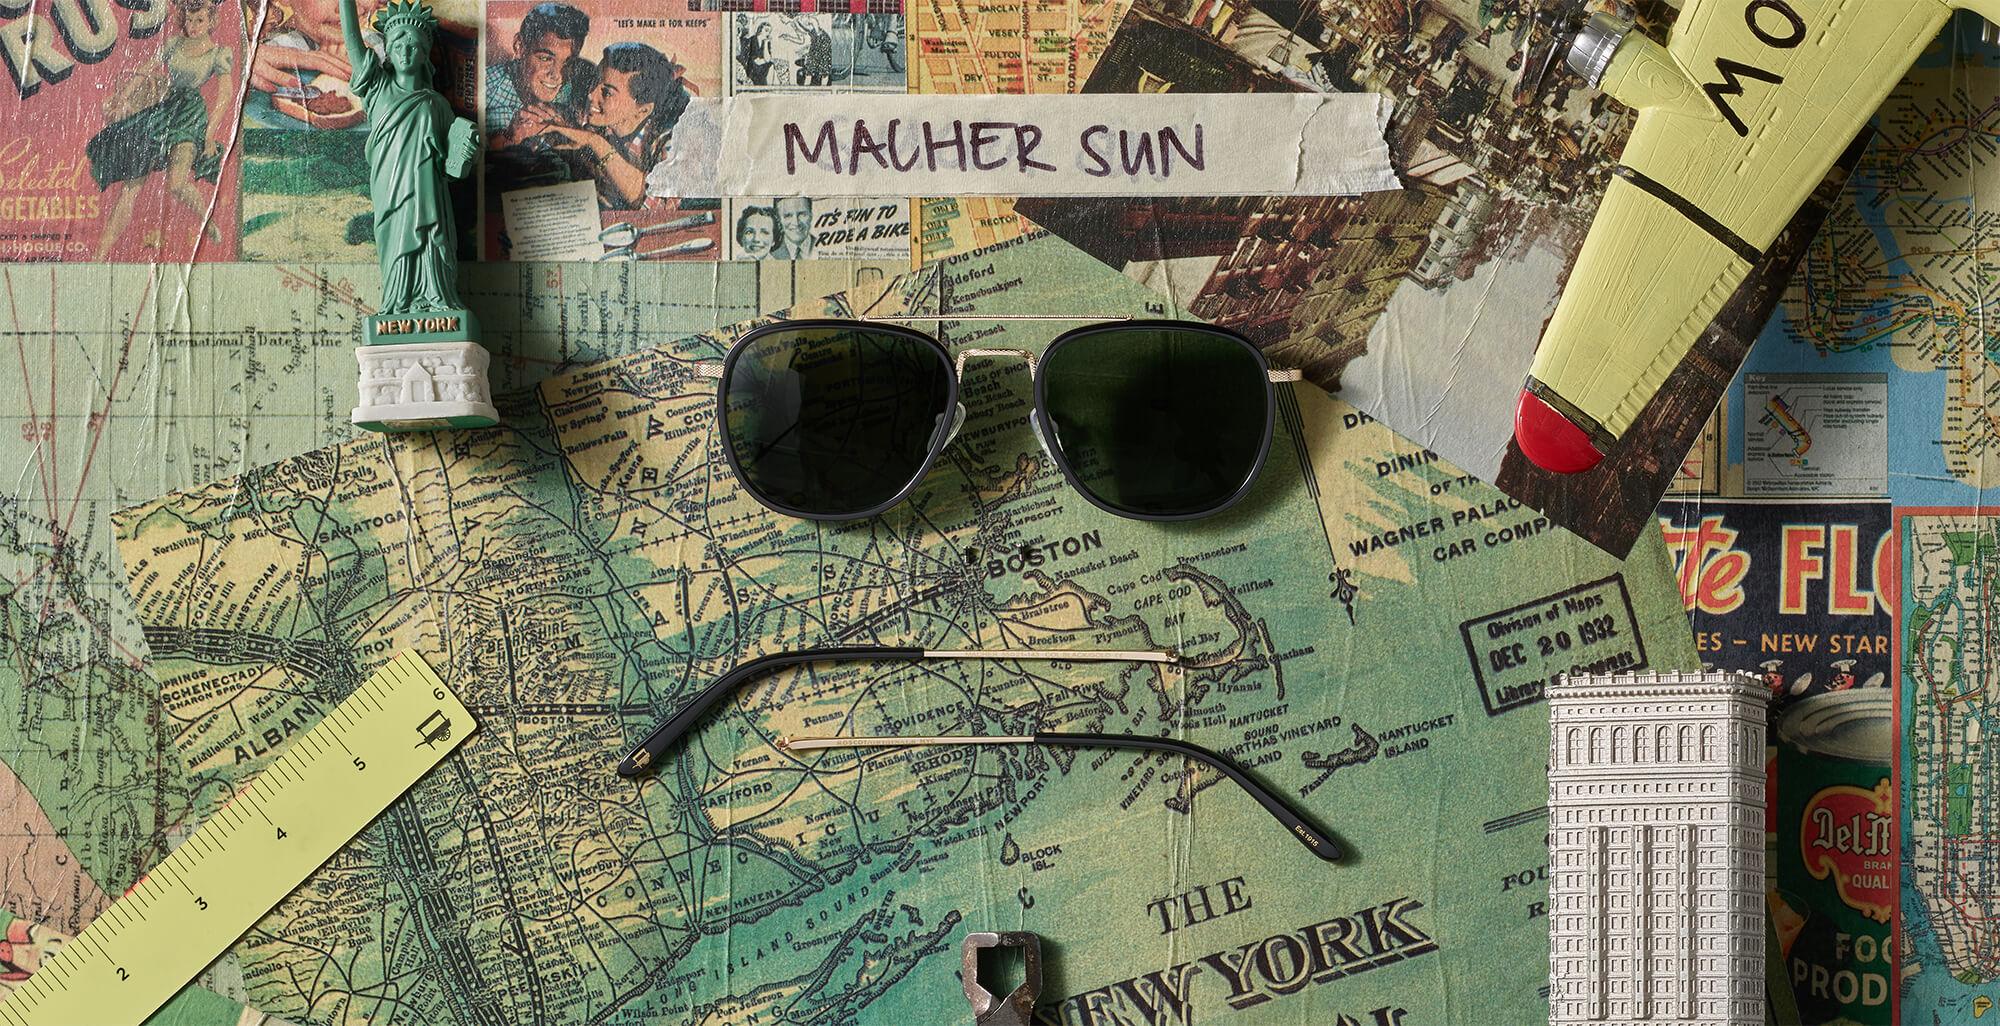 MACHER SUN